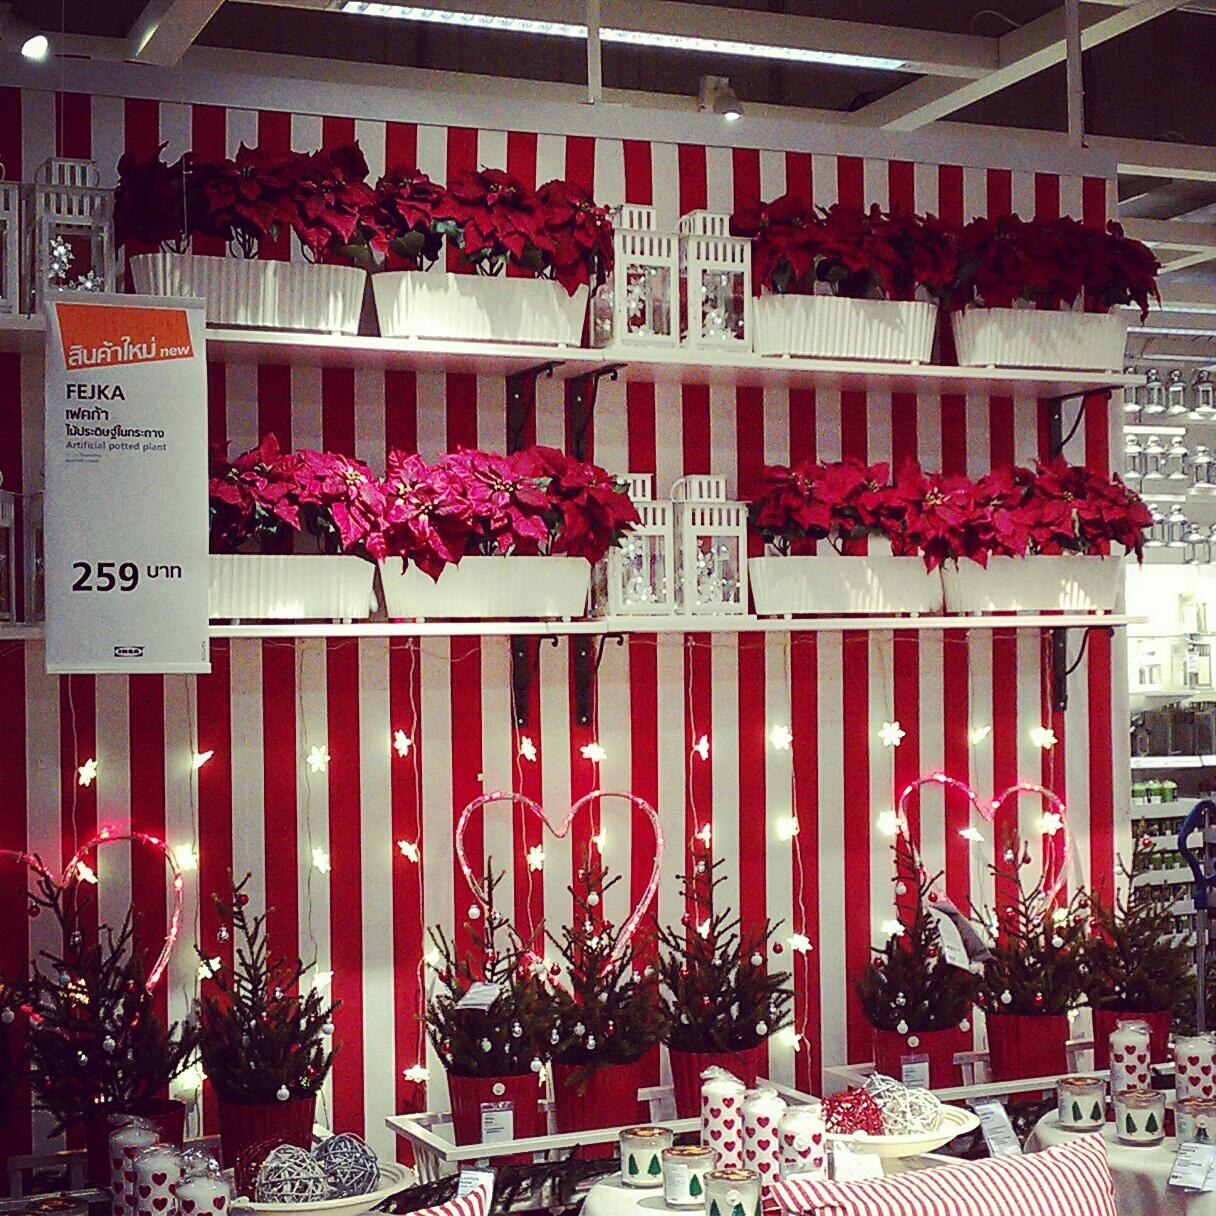 Ikea Christmas Decorations 2012: Christmas Decorations, IKEA Thailand